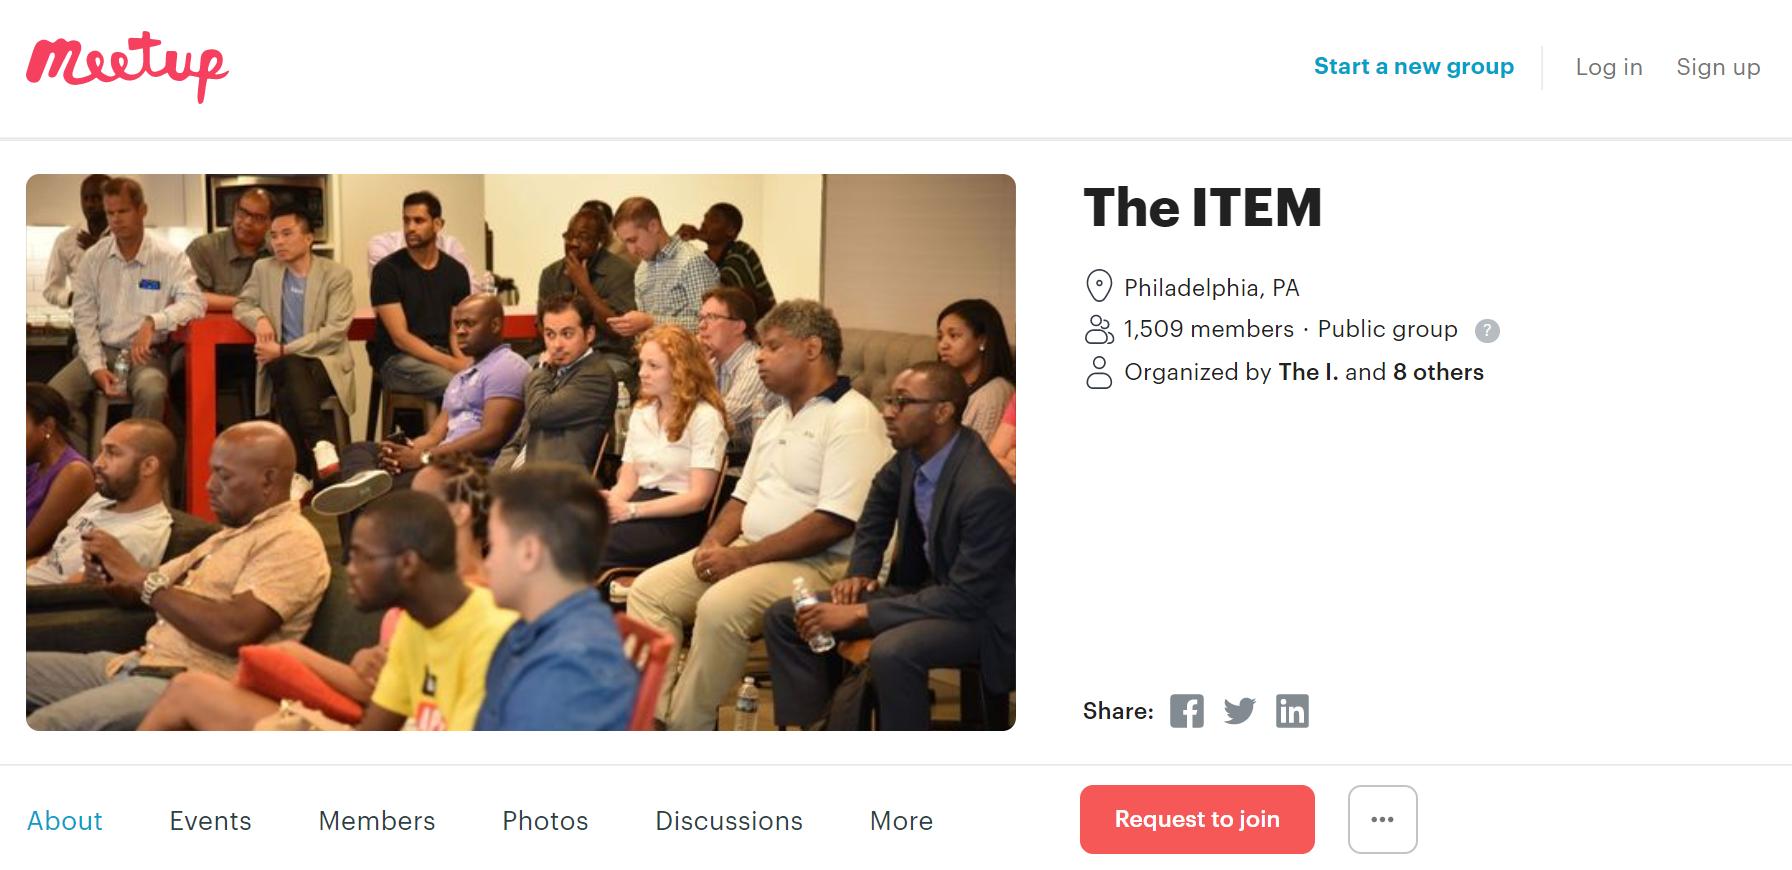 Top 10 Active Meetup Groups In Tech & Entrepreneurial Scene - Fig 6